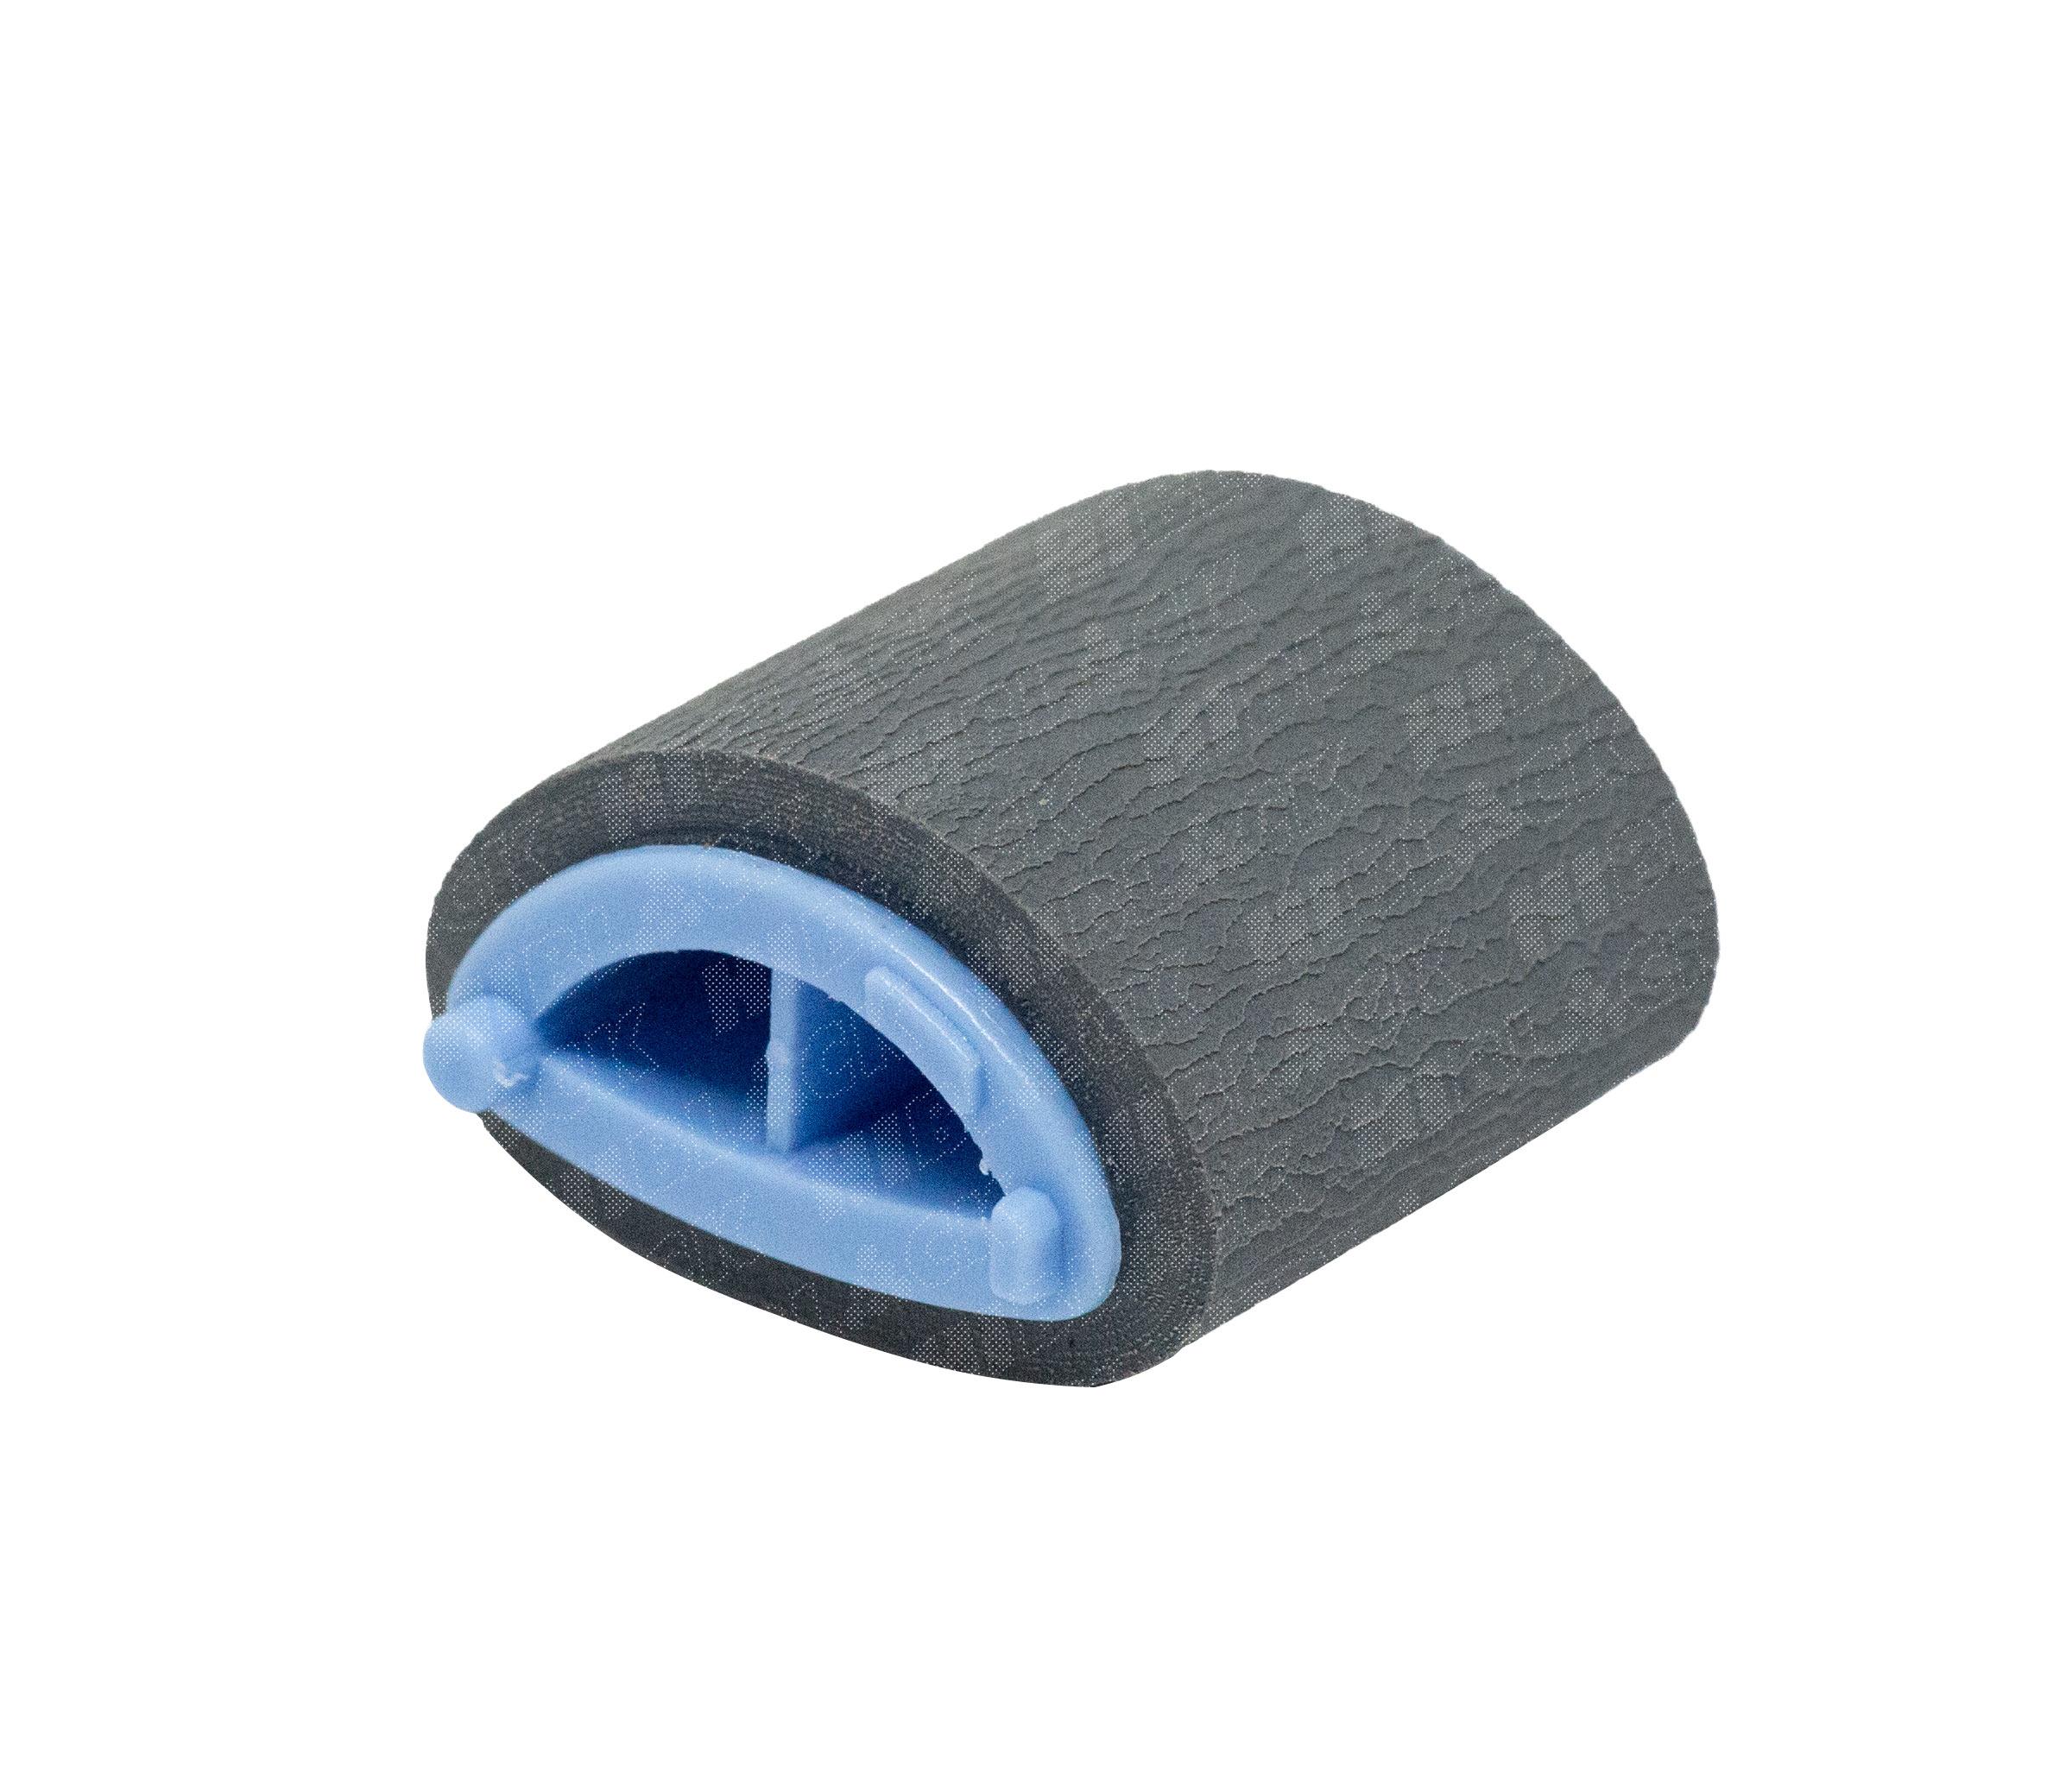 Ролик захвата бумаги (pick up roller) для HP LJ 1100 (Совместимый)